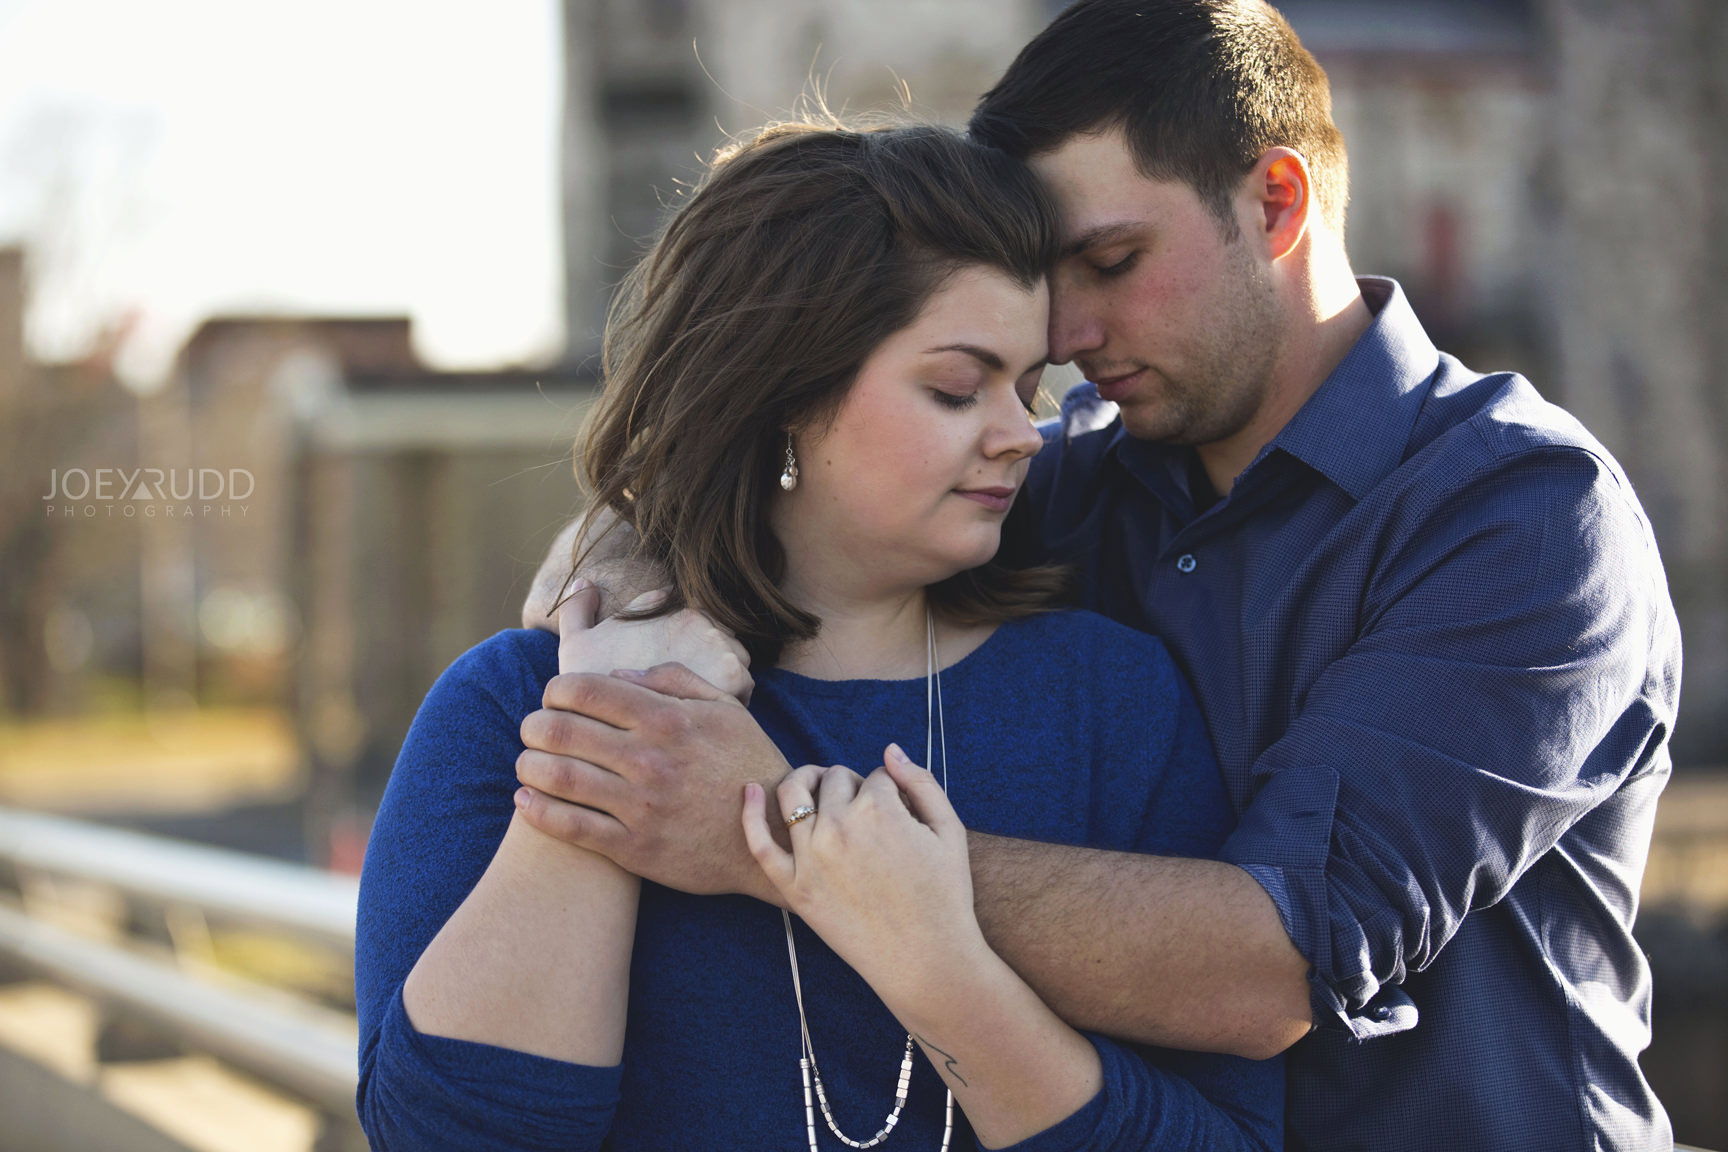 Almonte engagement photography by ottawa wedding photographer joey rudd photography poses lifestyle